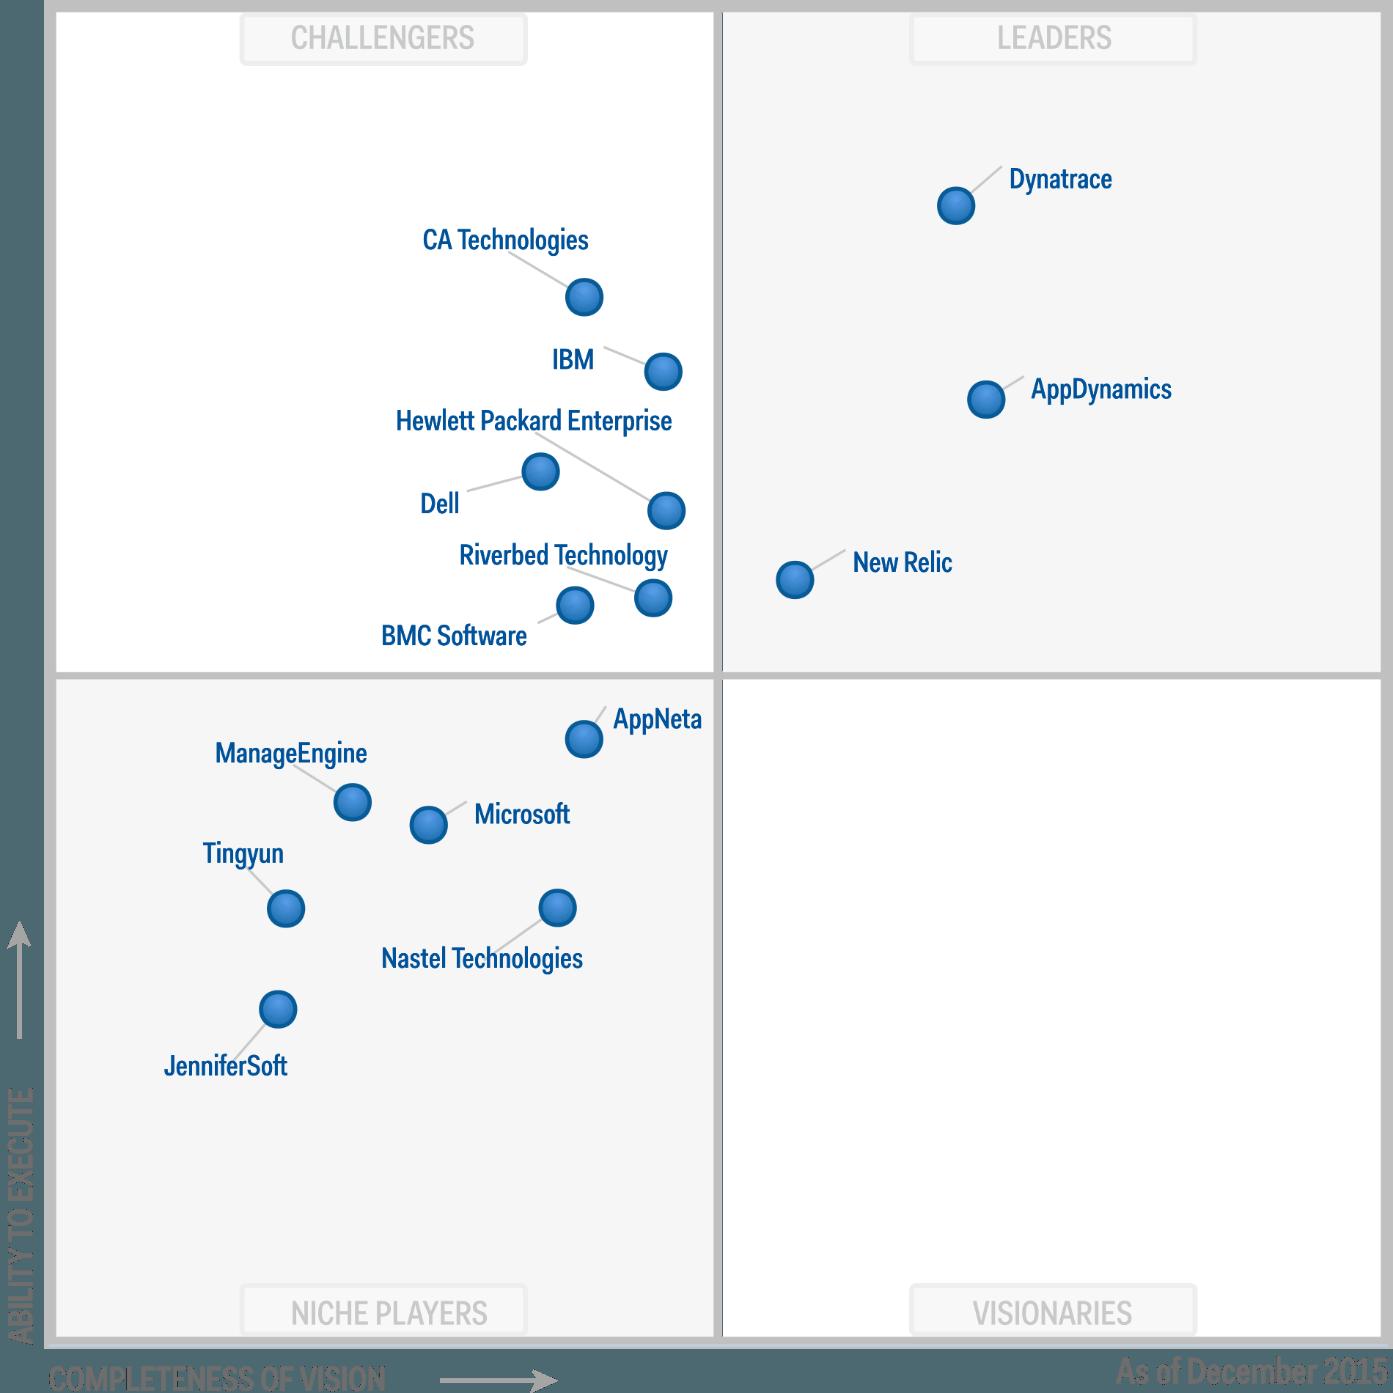 APM, leadership Dynatrace nel Gartner Magic Quadrant